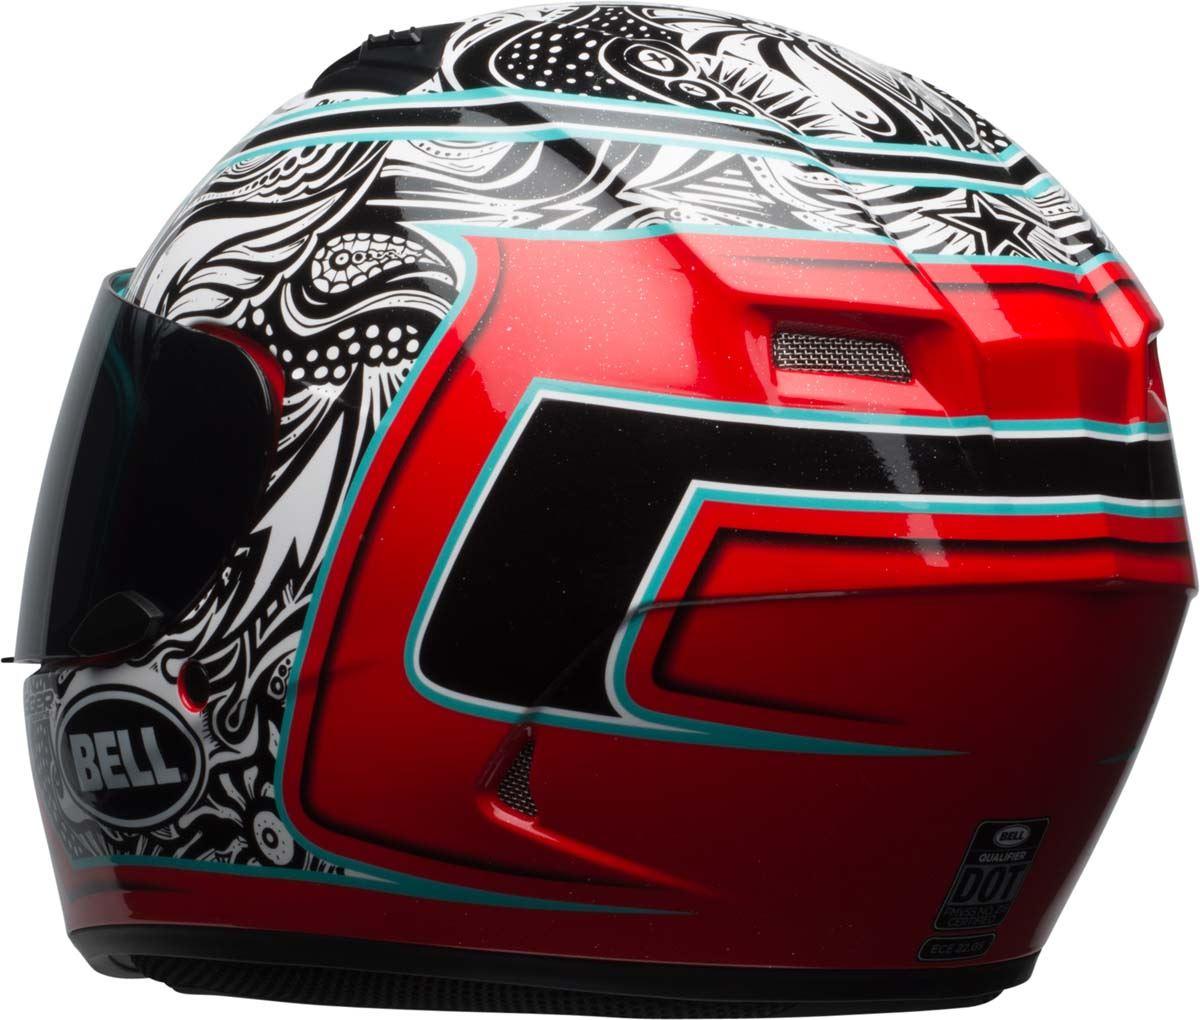 Bell-Qualifier-Helmet-Full-Face-Motorcycle-Clear-Shield-DOT-XS-3XL miniature 51